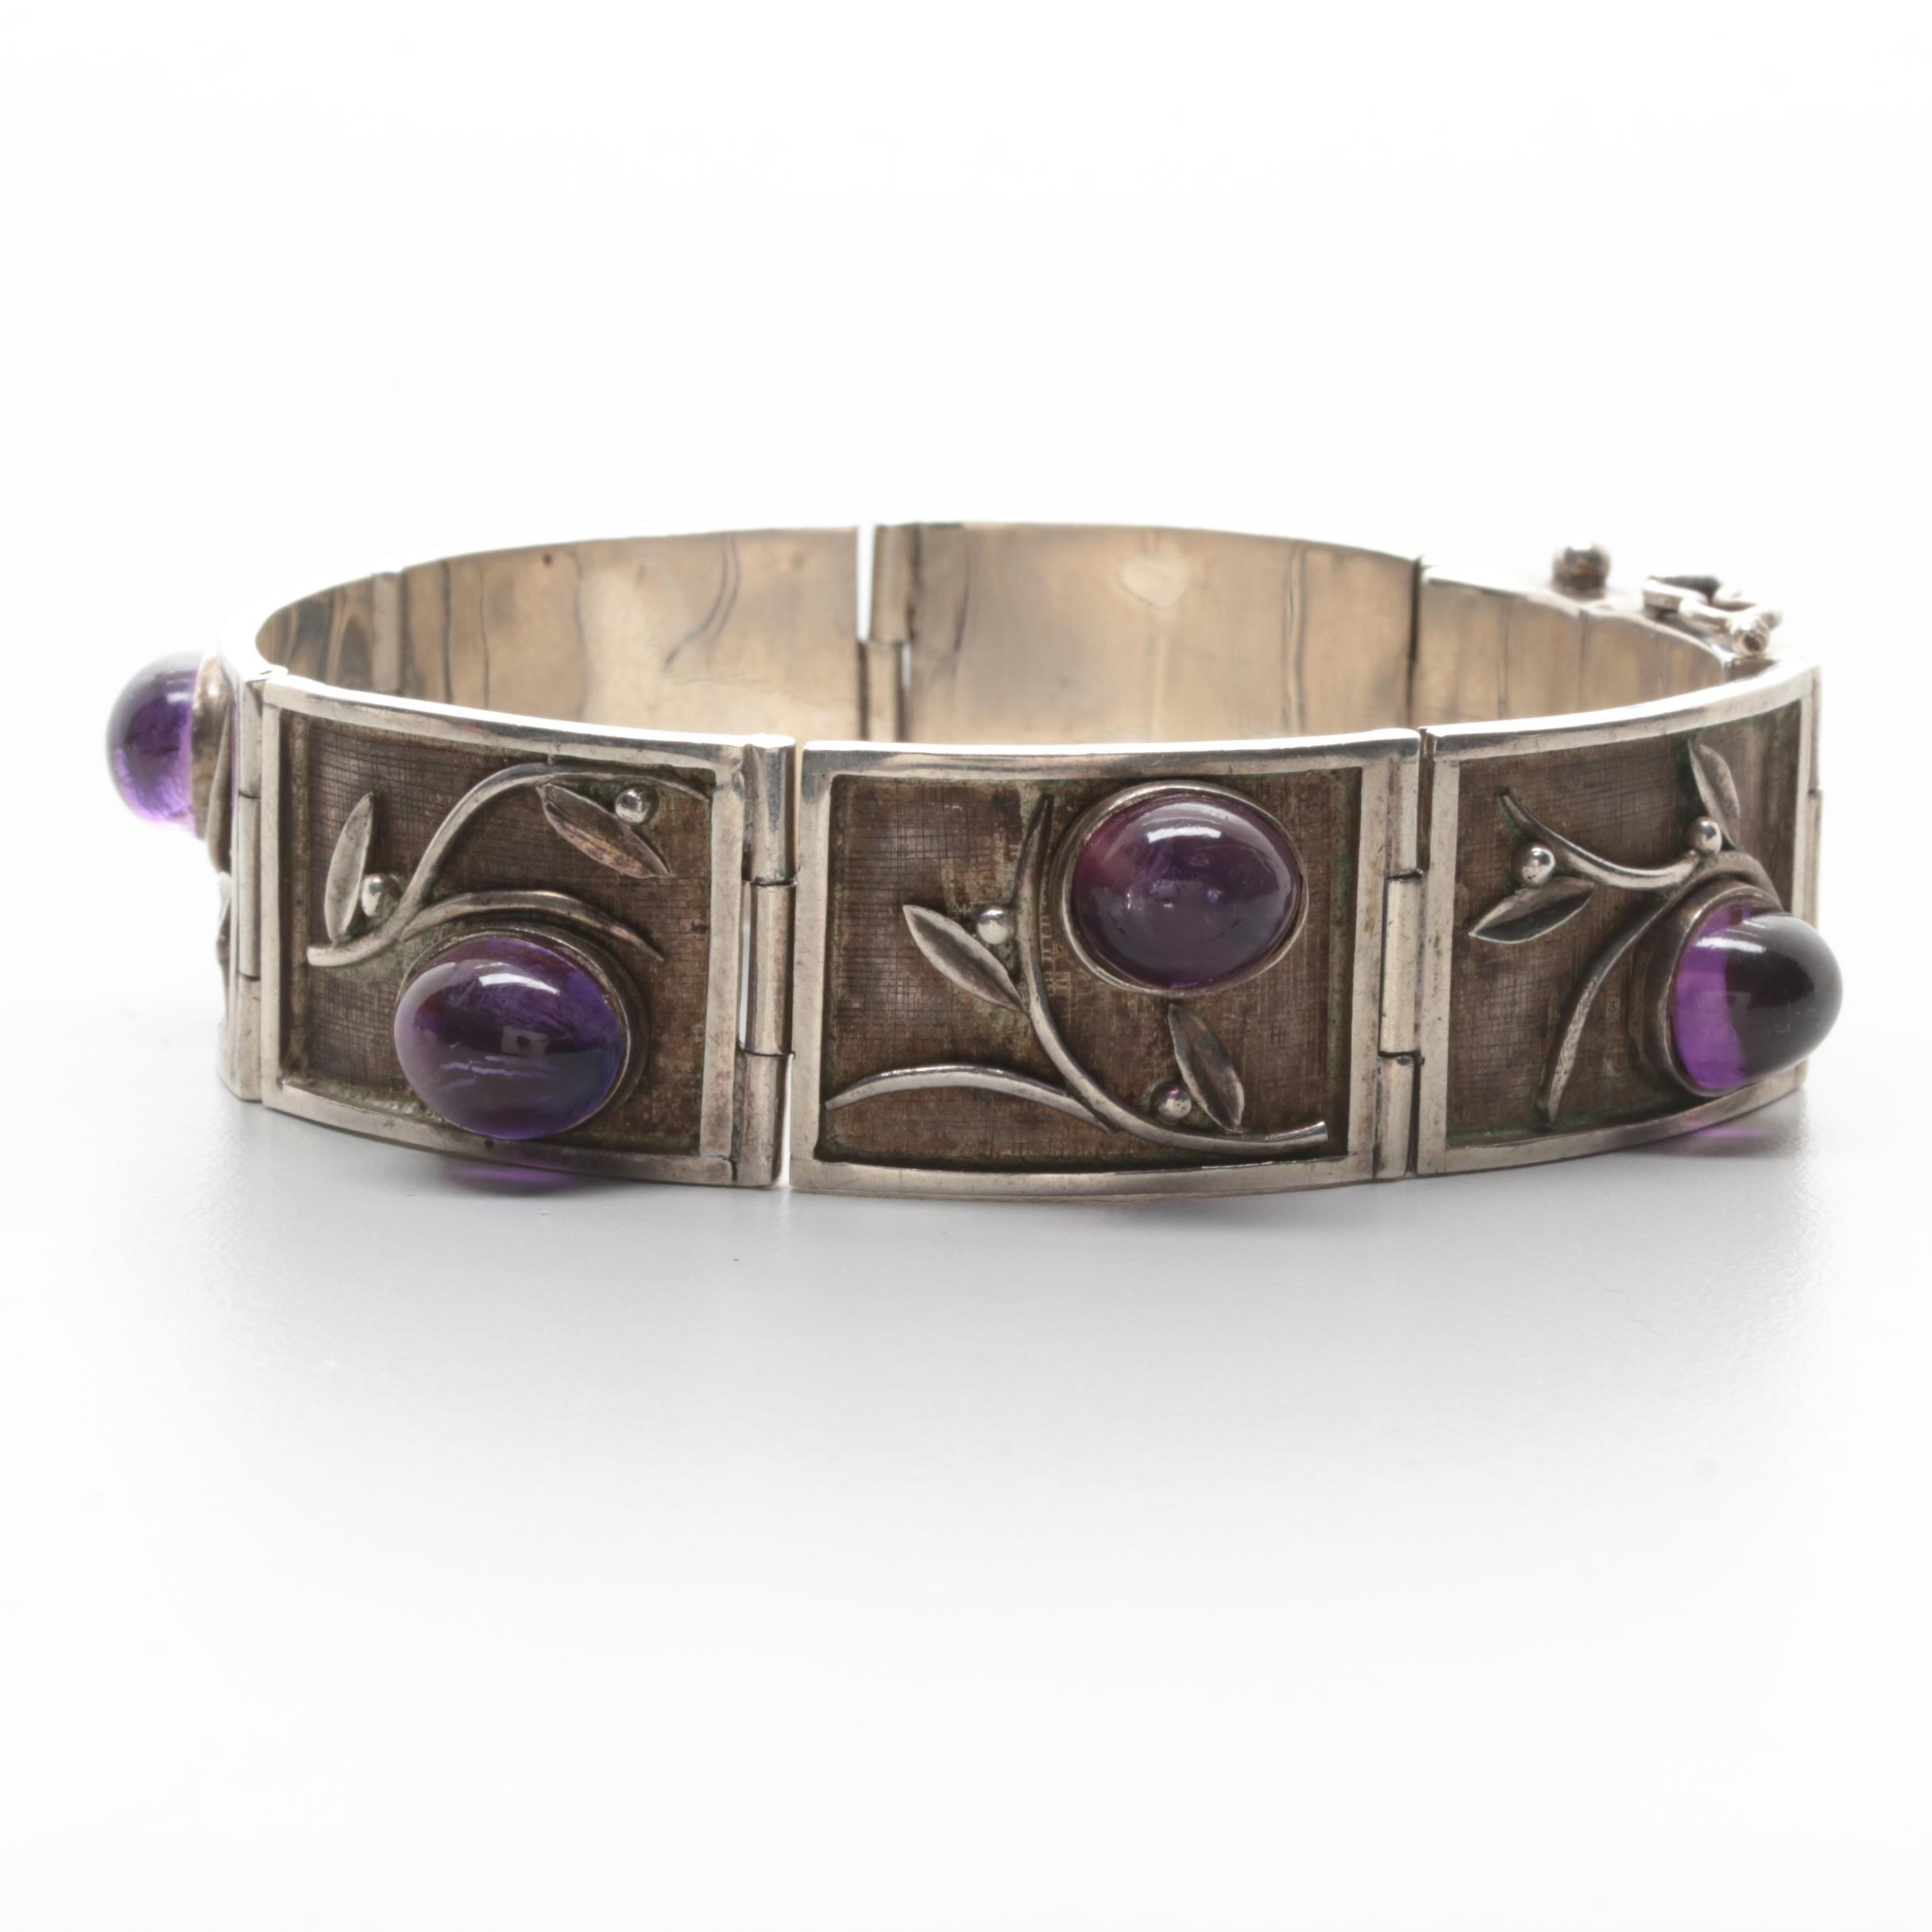 Mexican Sterling Silver Amethyst Fancy Link Bracelet with Foliage Motifs